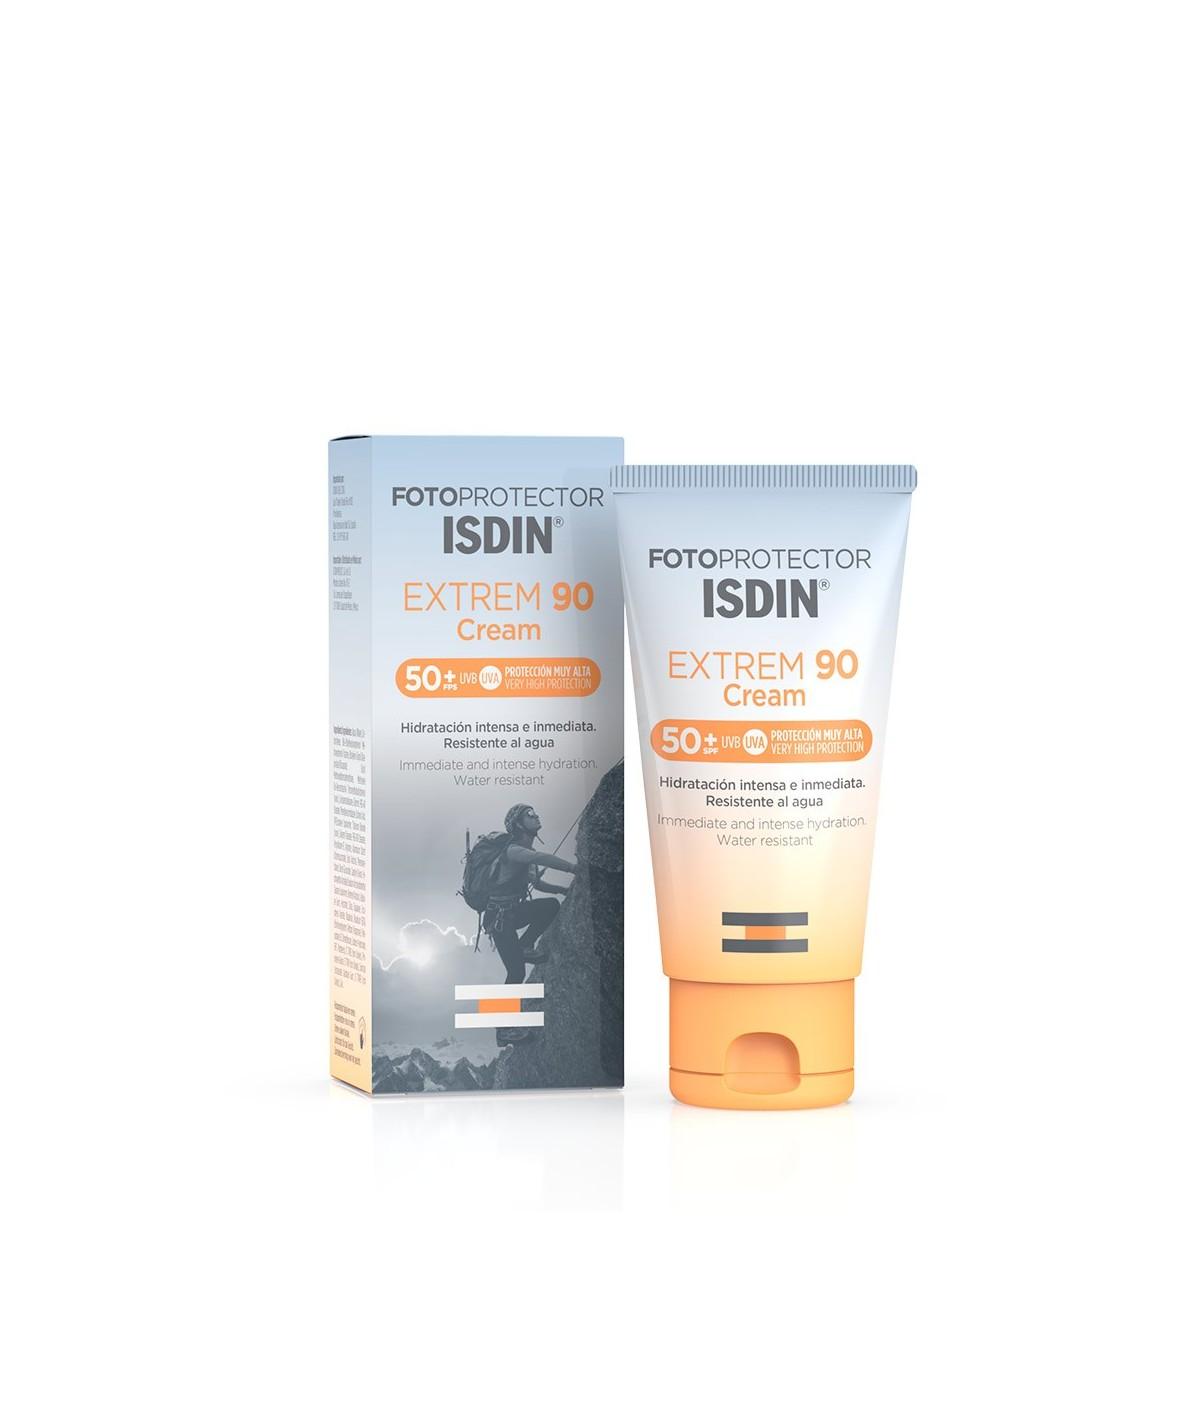 Fotoprotector ISDIN Extrem 90 Cream SPF 50+